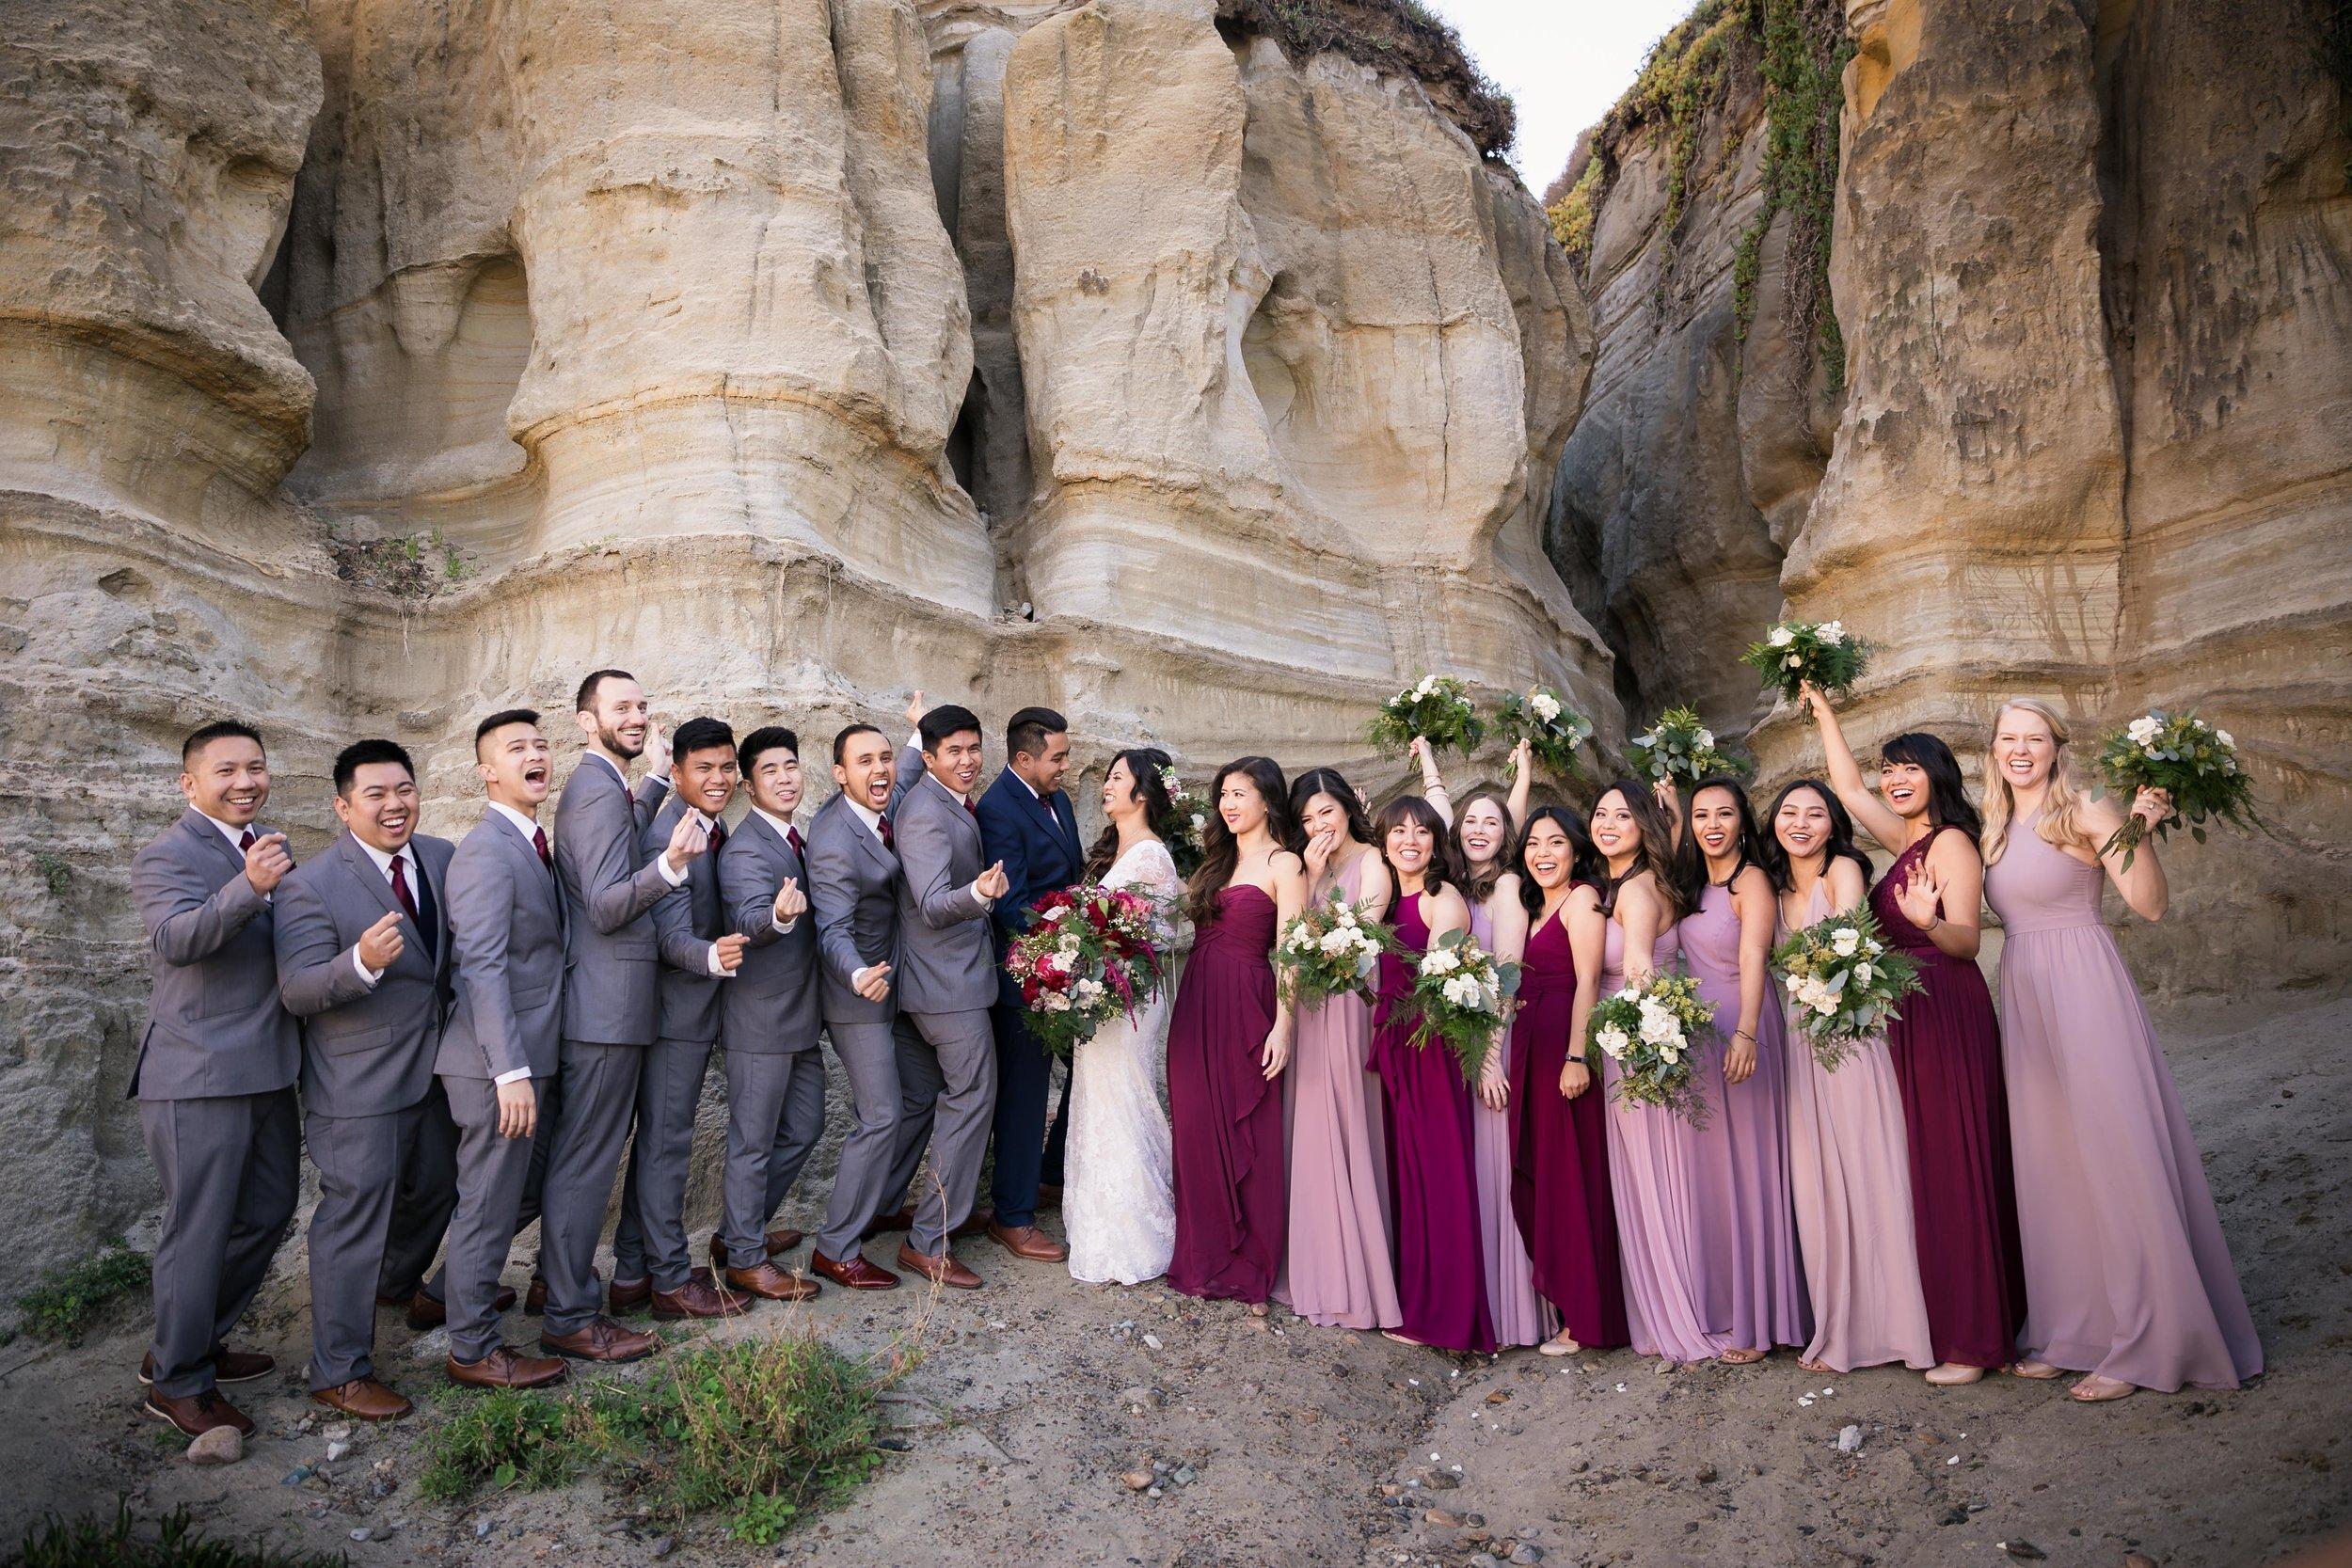 southern_california_wedding_joshuachun_photography-6.JPG